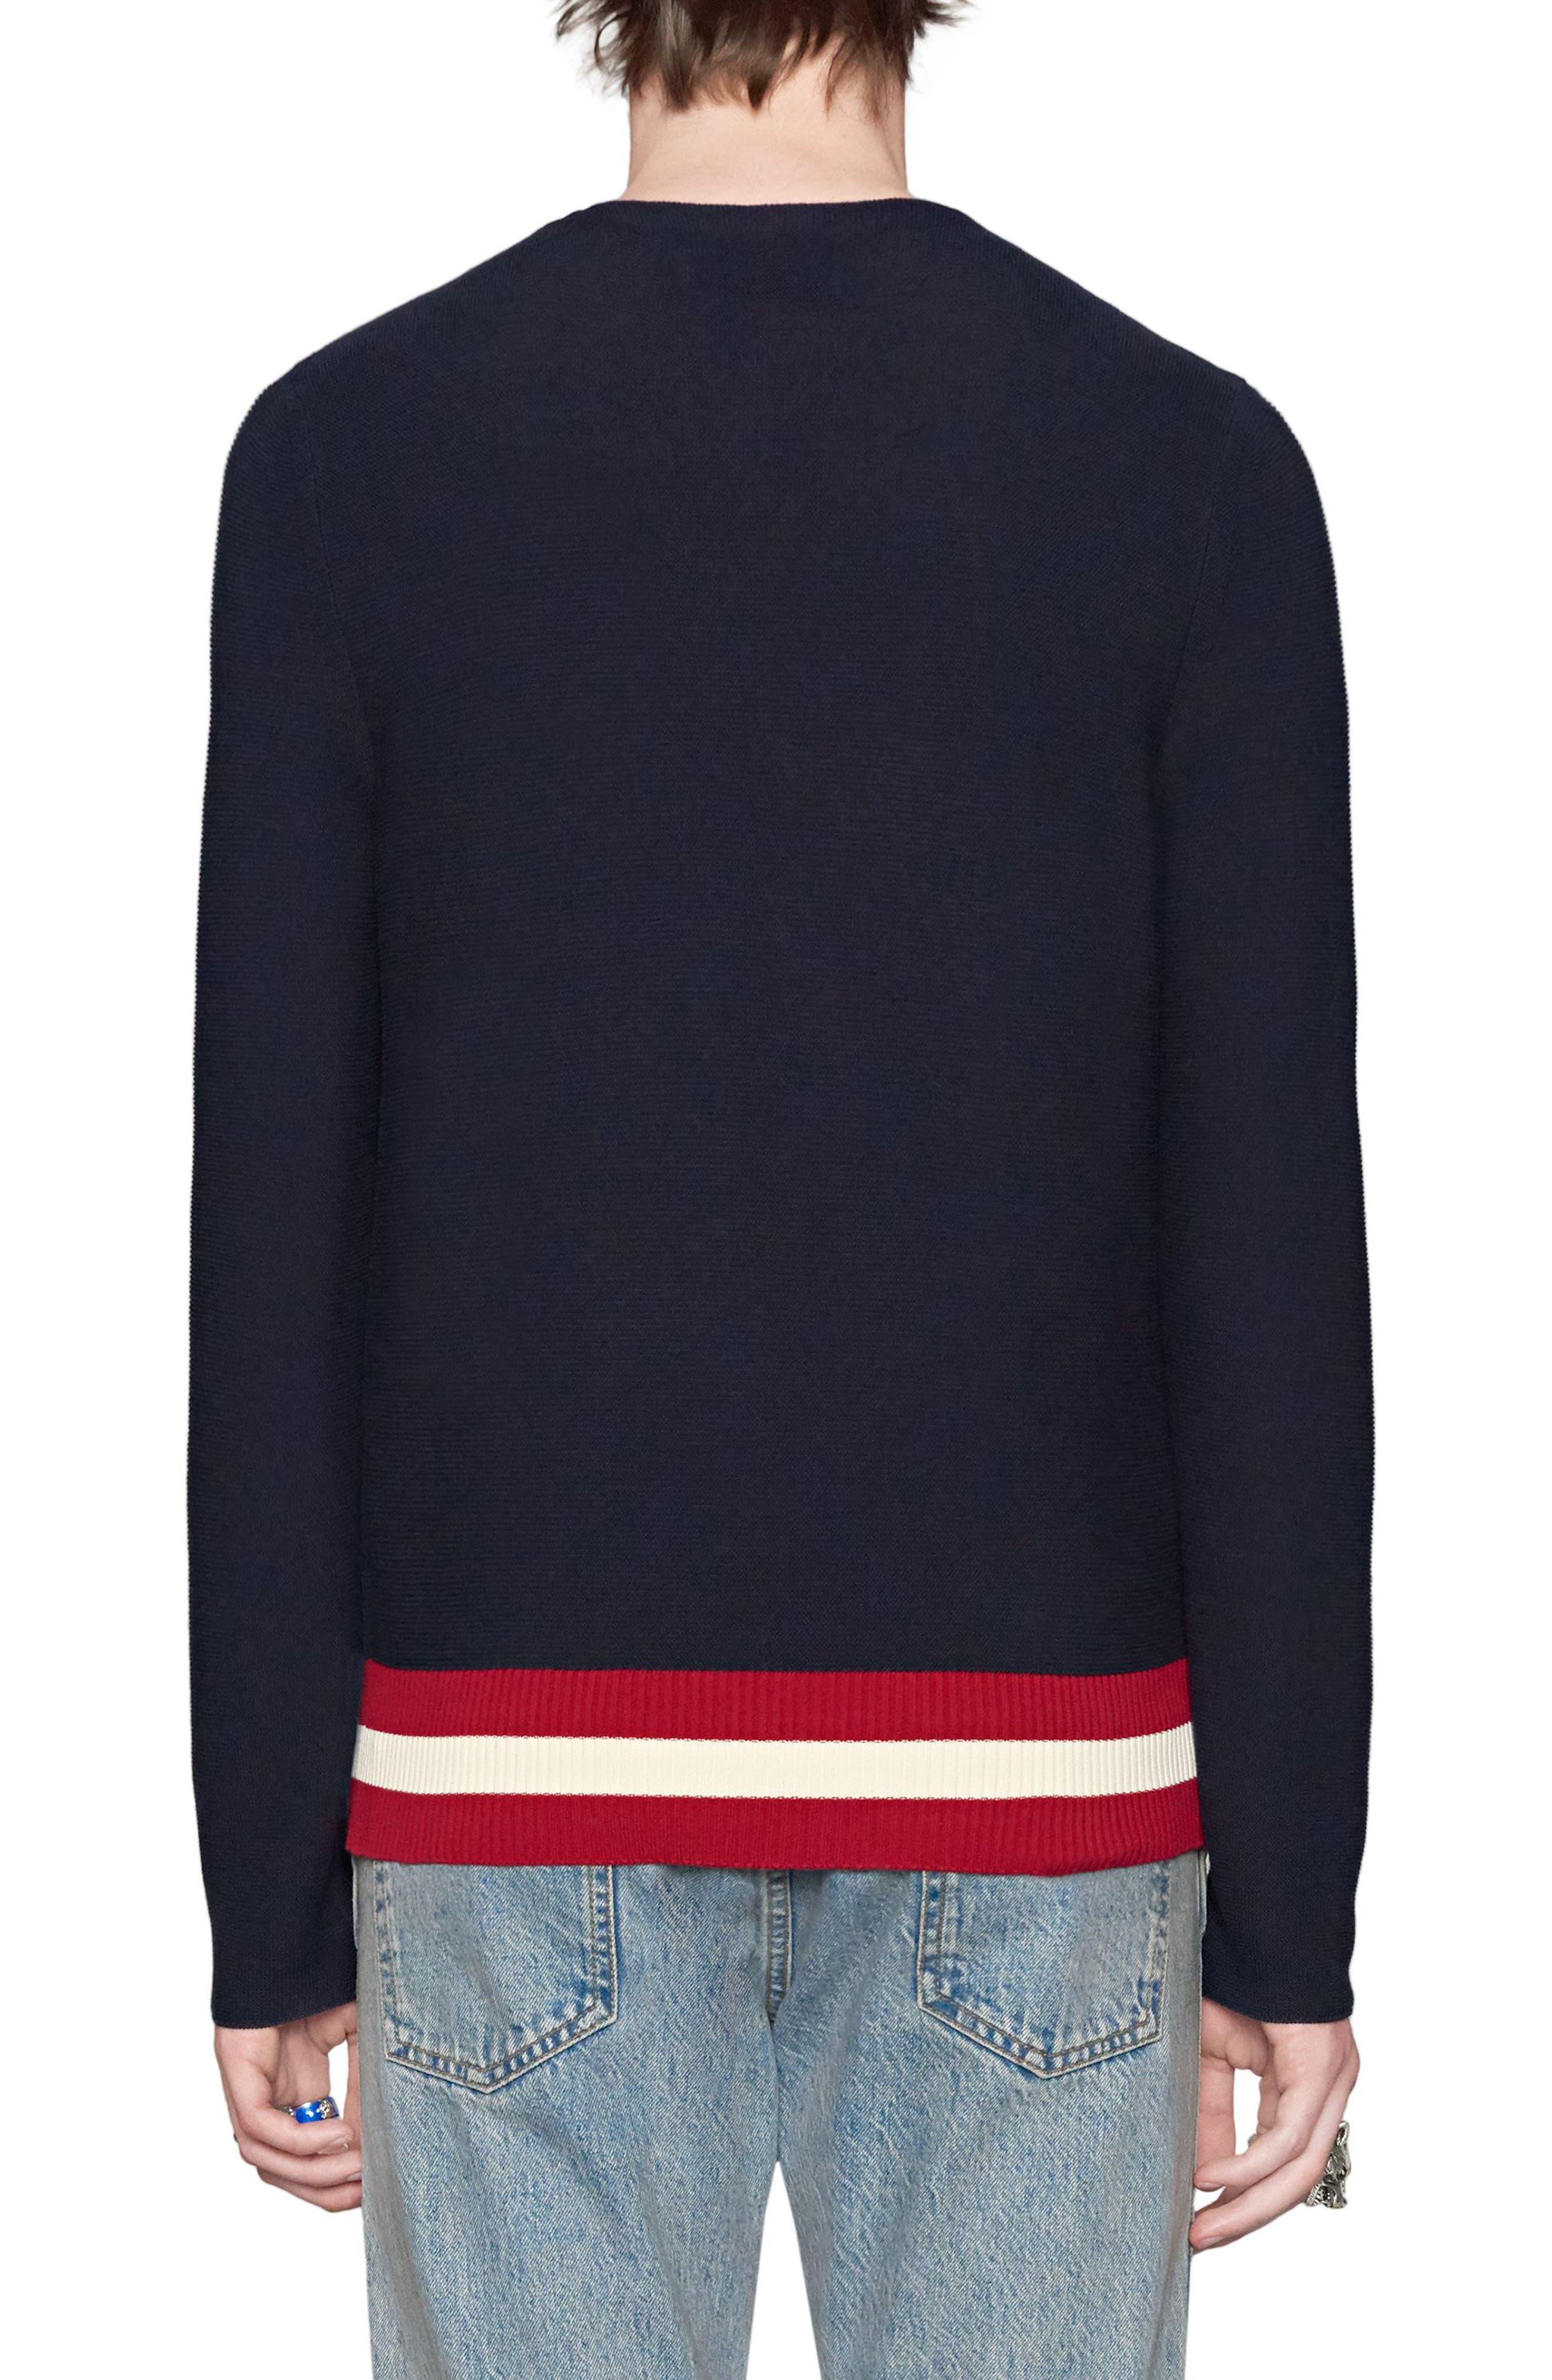 GUCCI,                             Bee Crest Crewneck Sweater,                             Alternate thumbnail 2, color,                             493